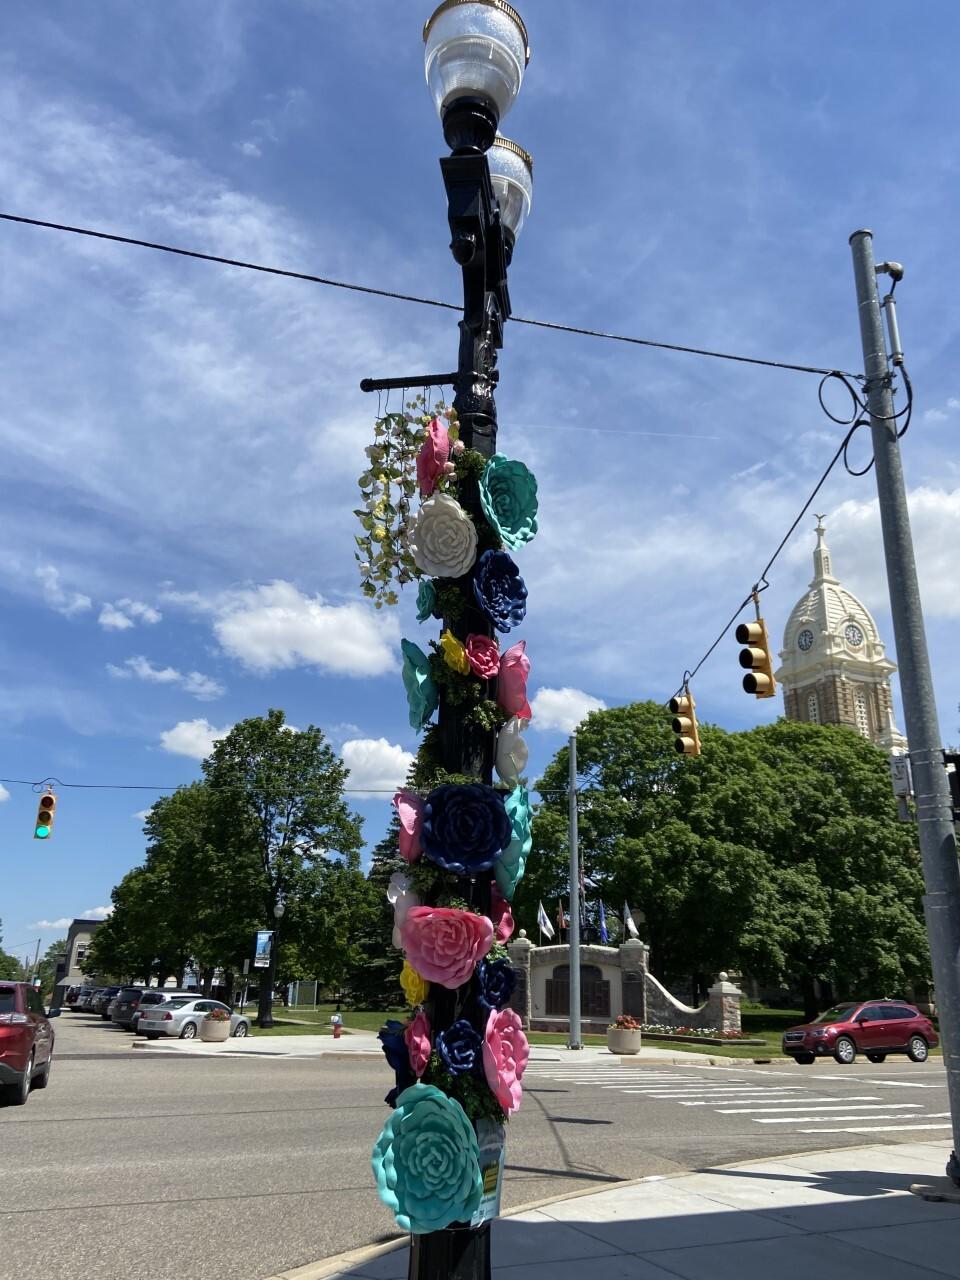 Light pole outside of Howard Hanna in downtown Mason